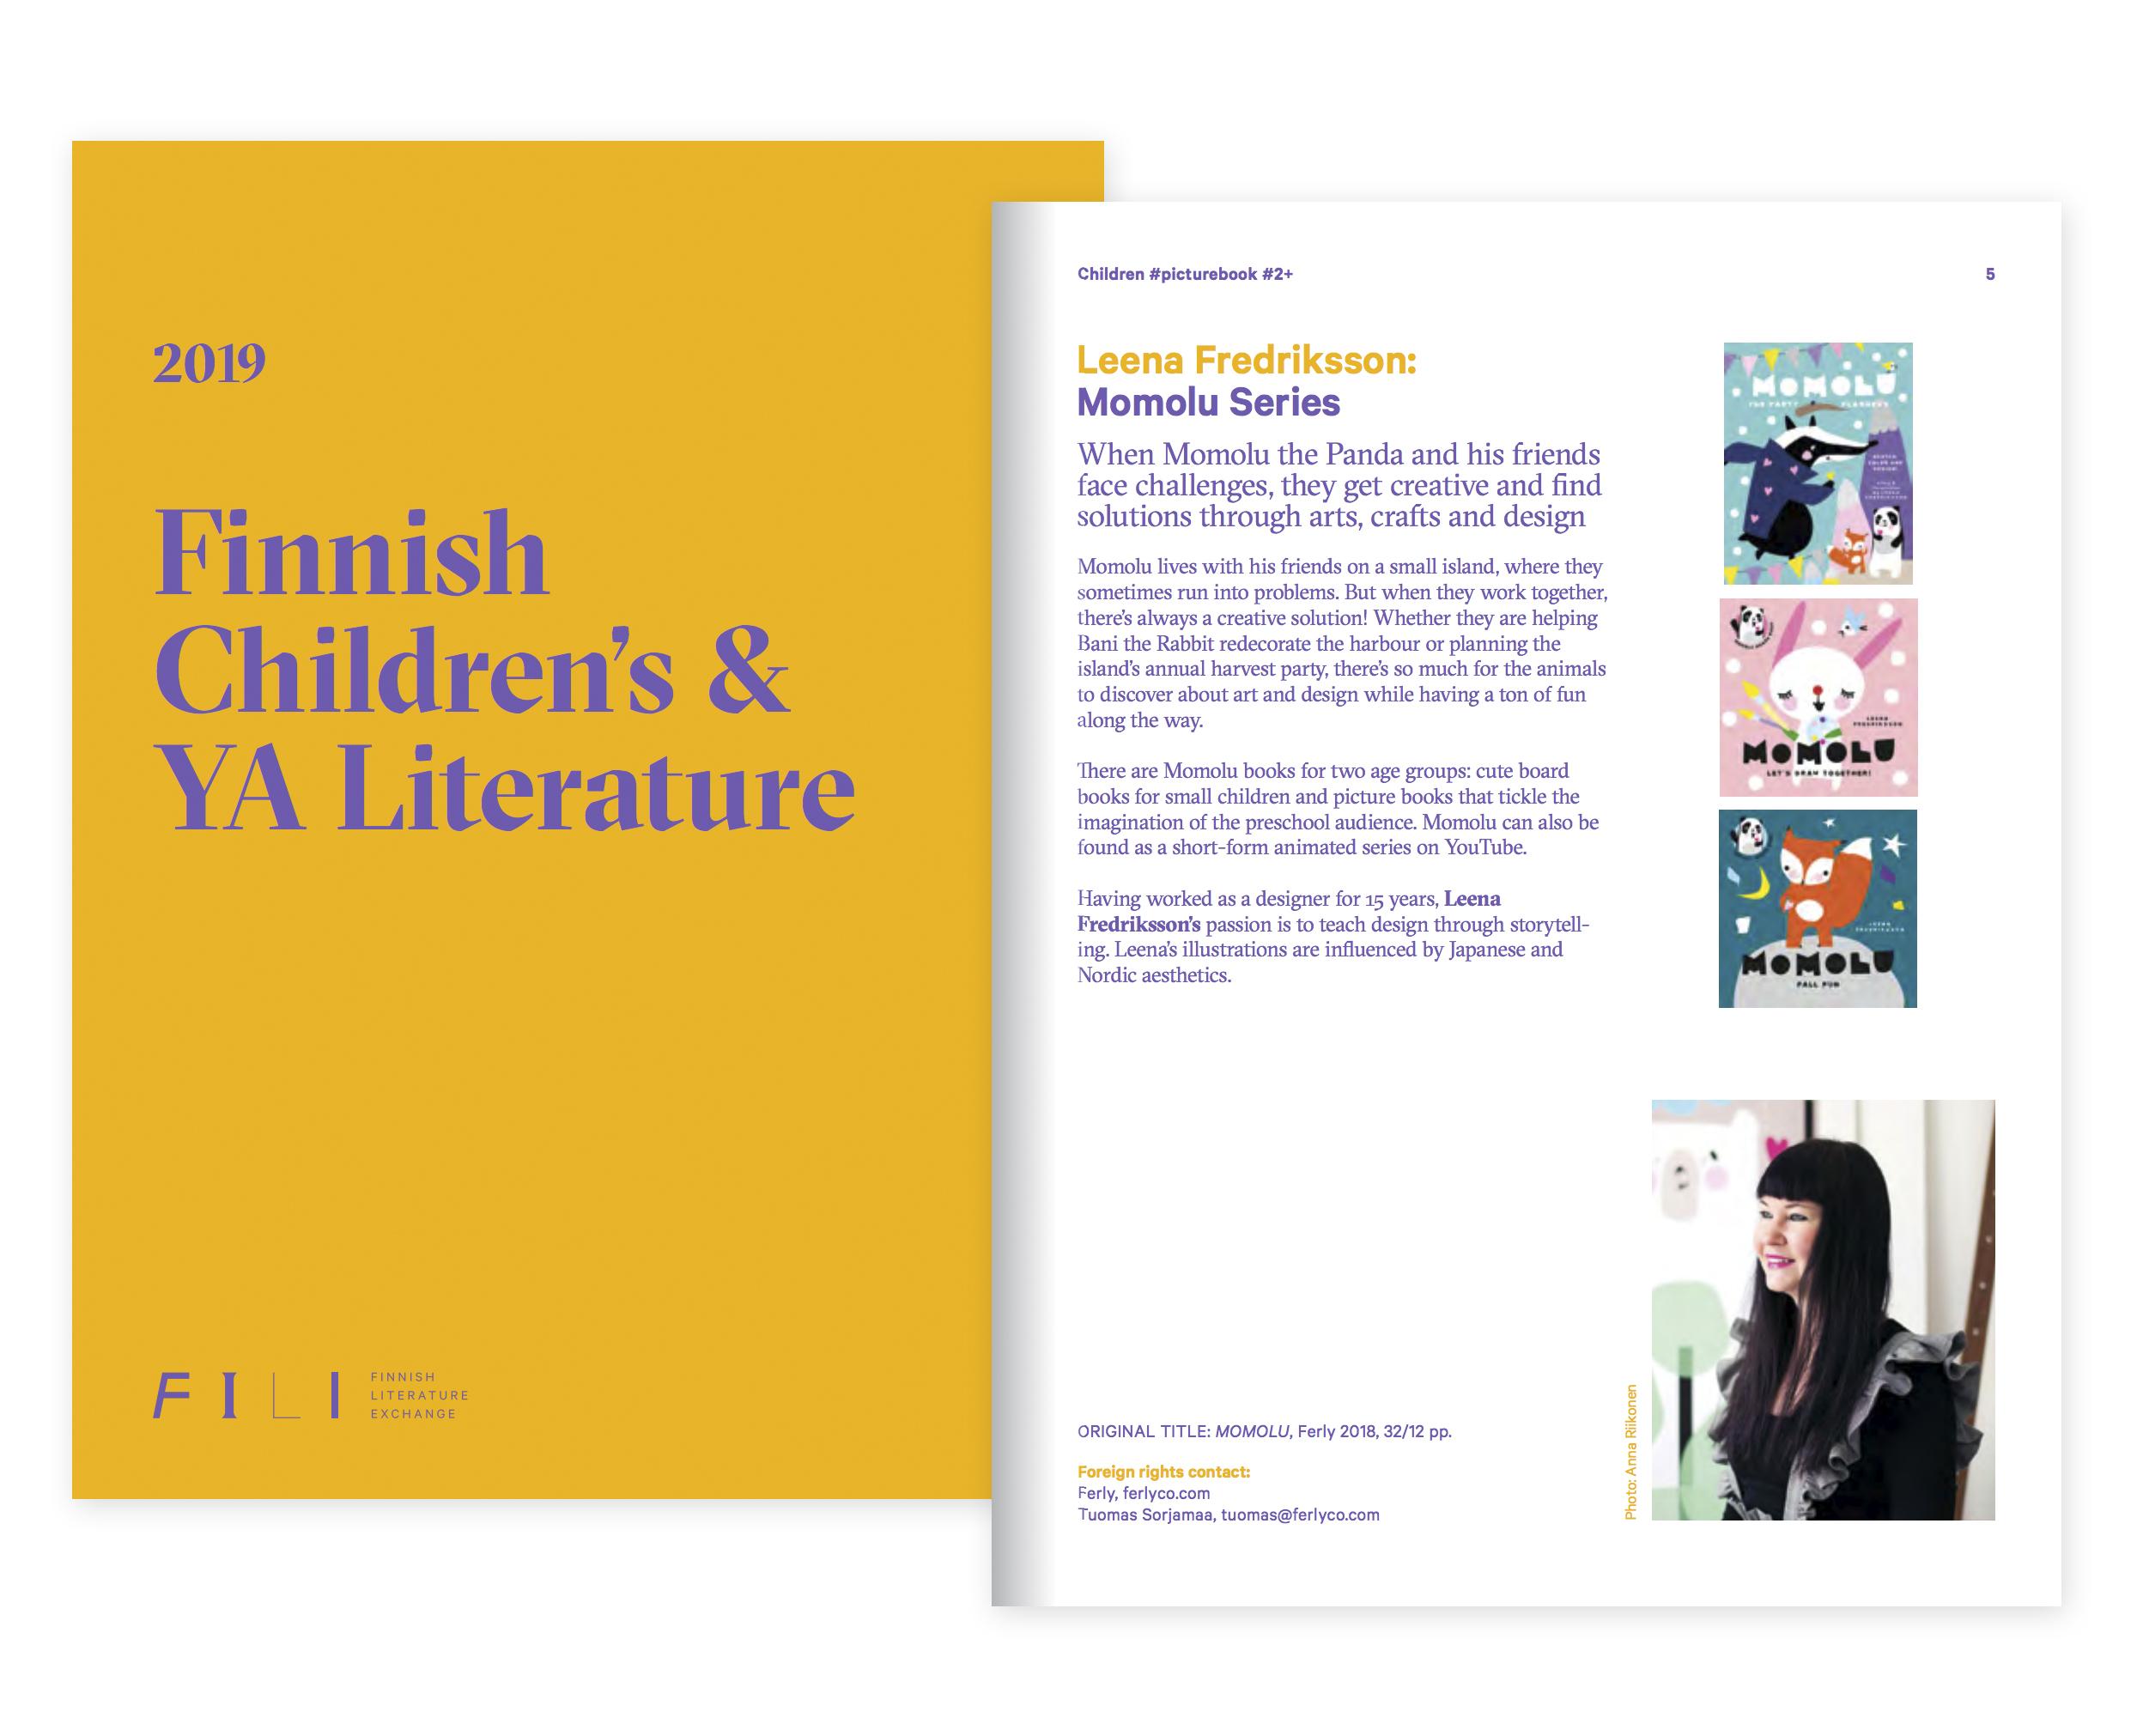 momolu_bookseries_hr2.jpg